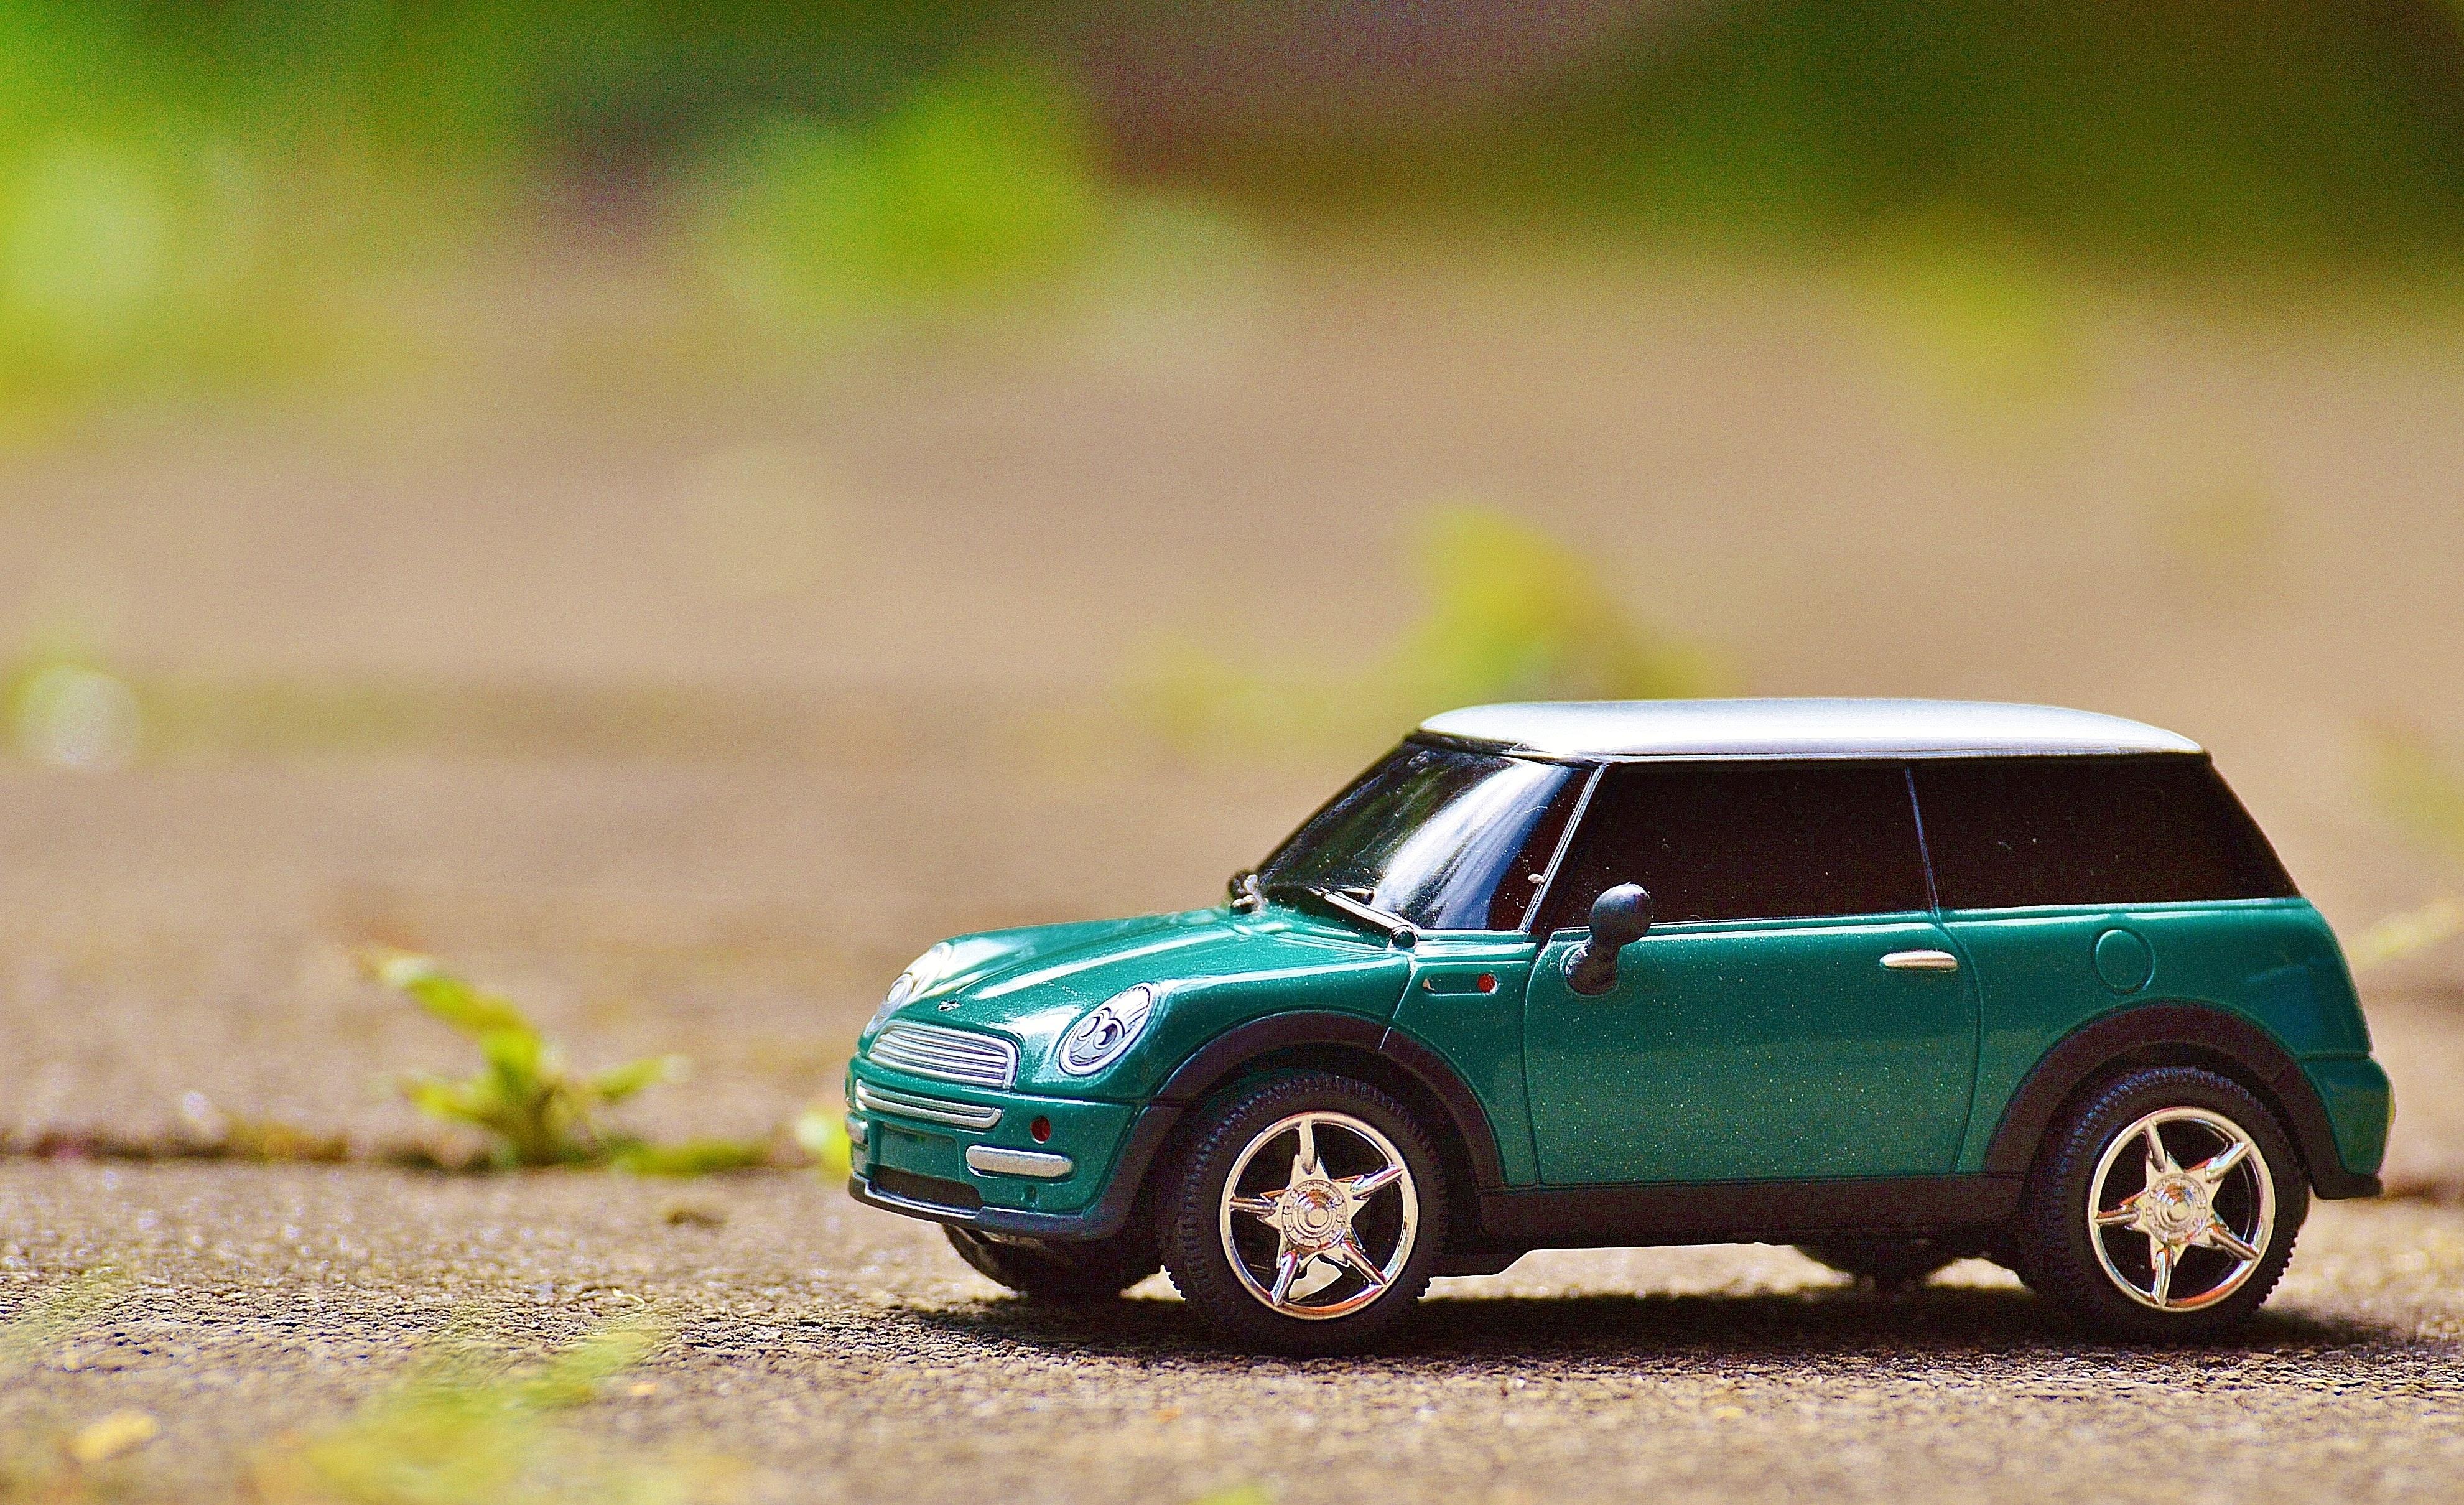 Auto Bilder · Pexels · Kostenlose Stock Fotos